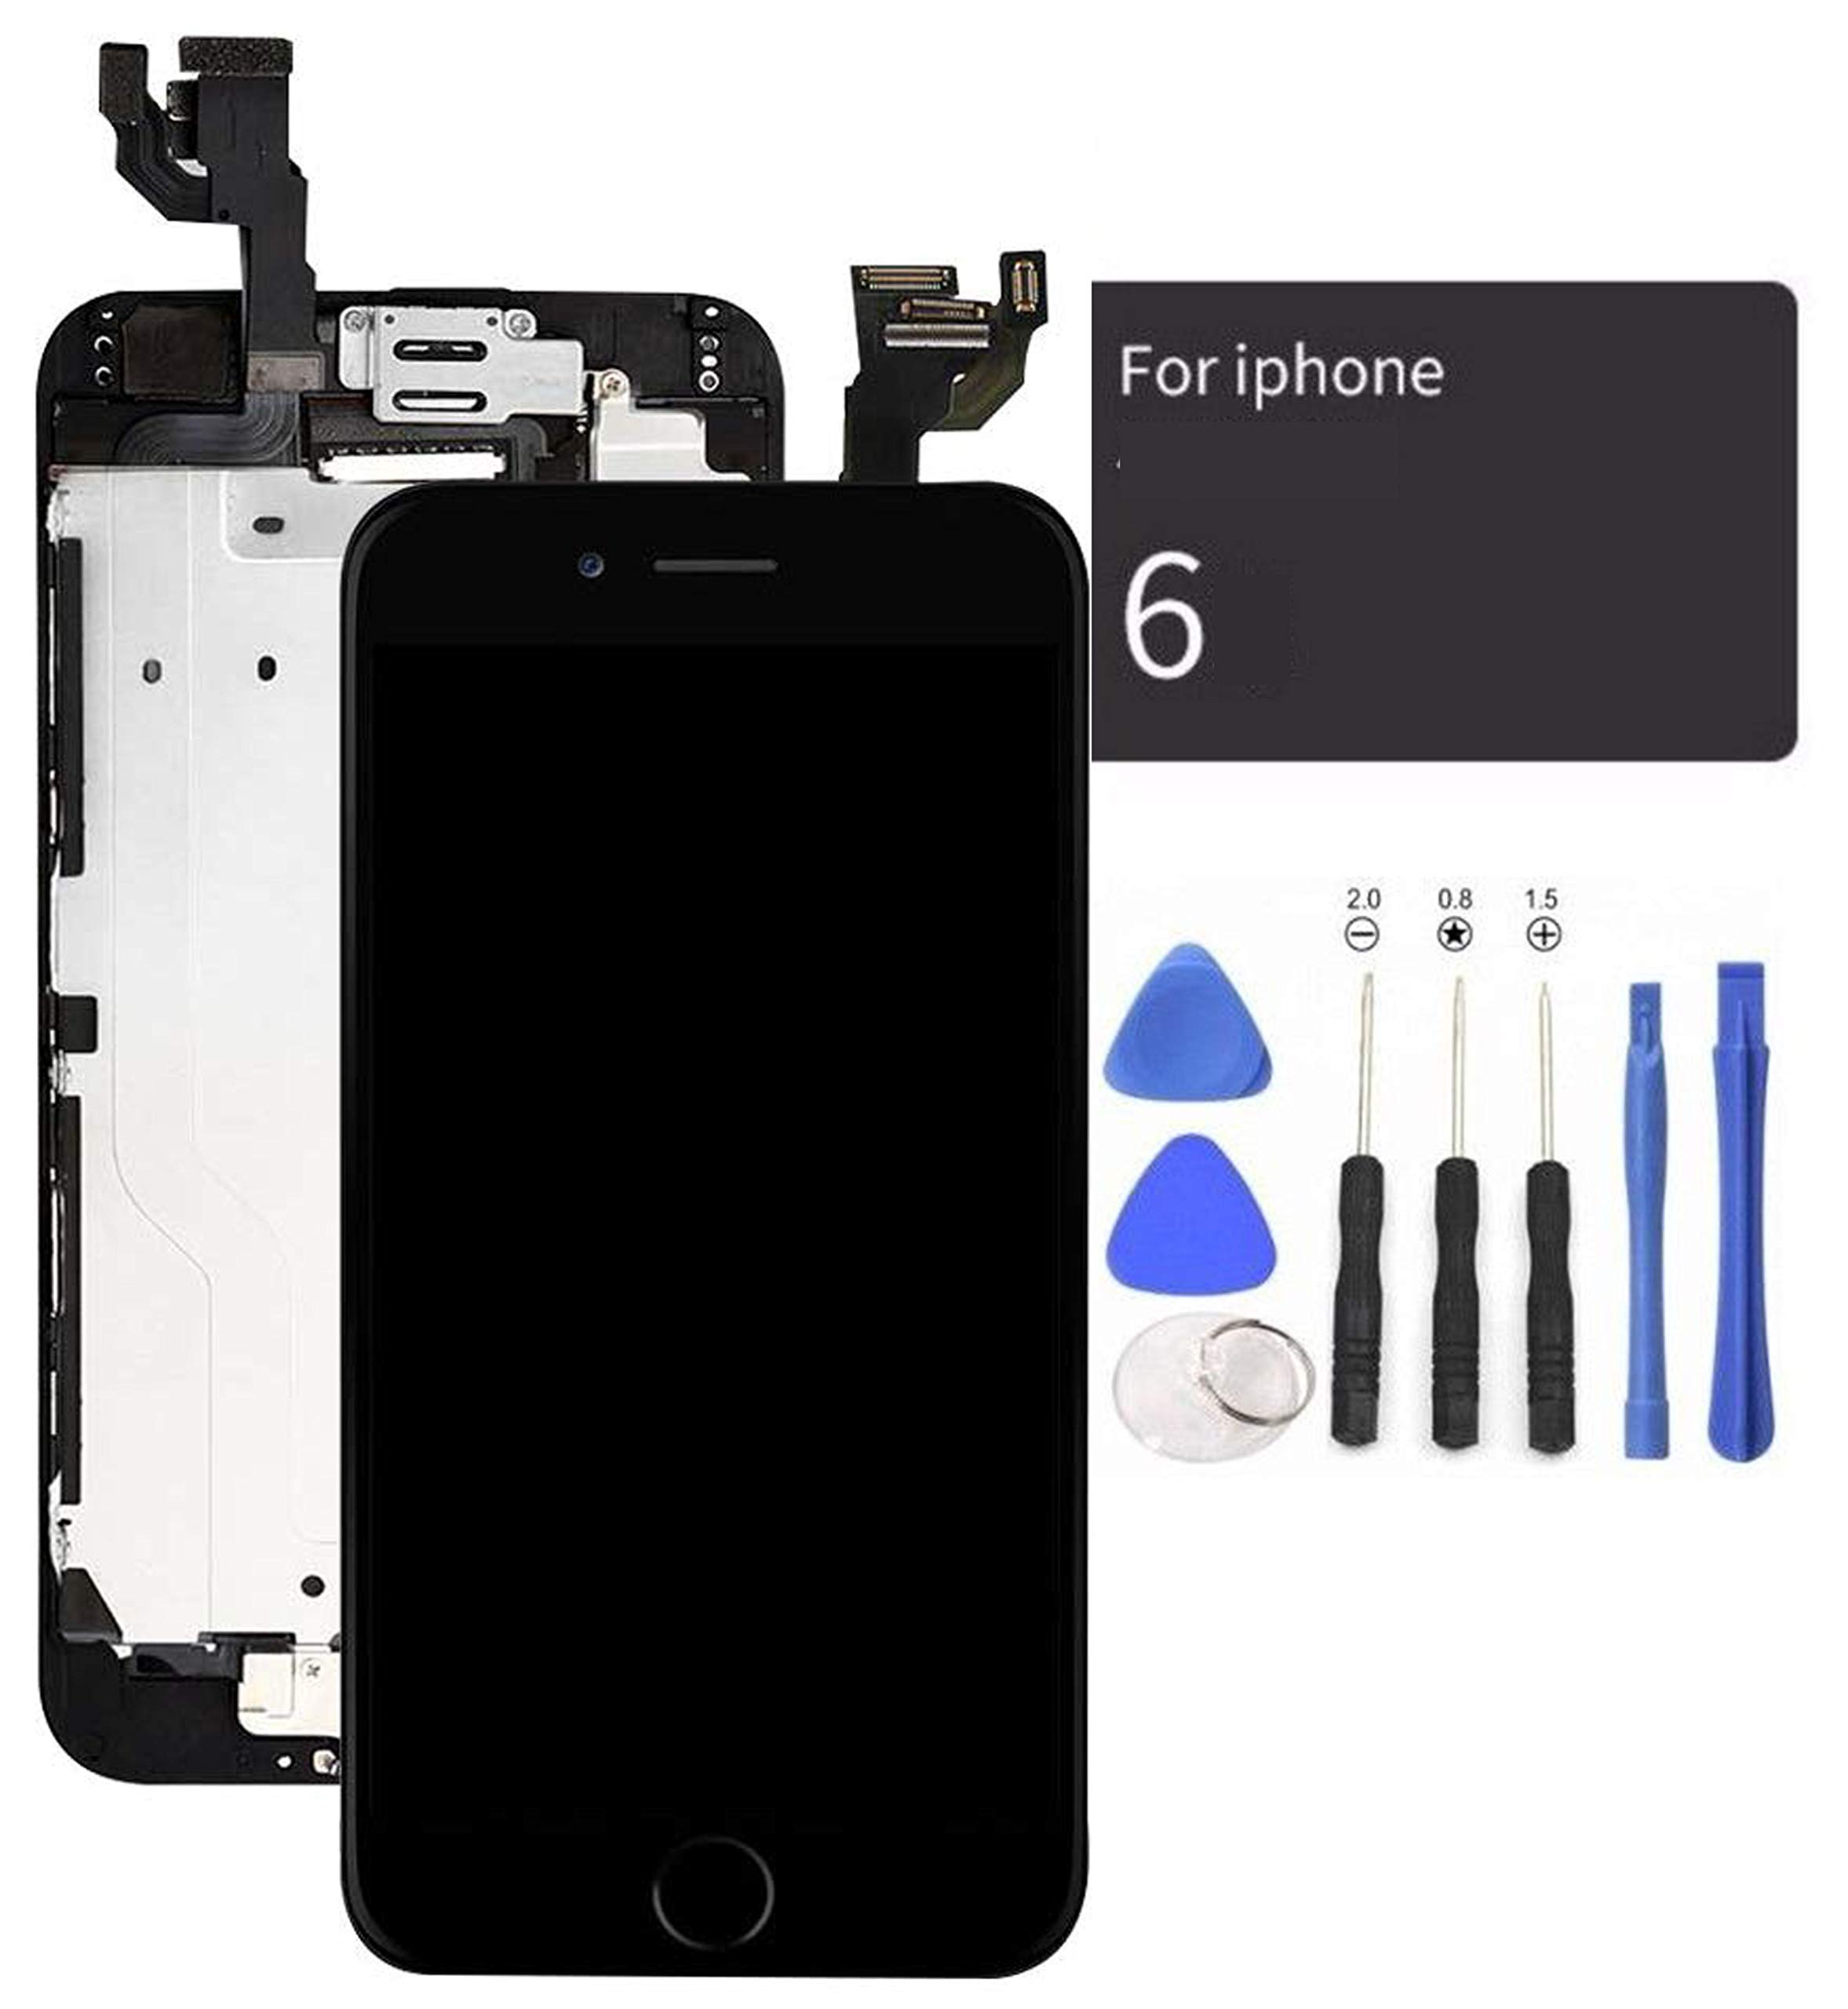 Modulo LCD Negro para IPhone 6 4.7 Inch  -250